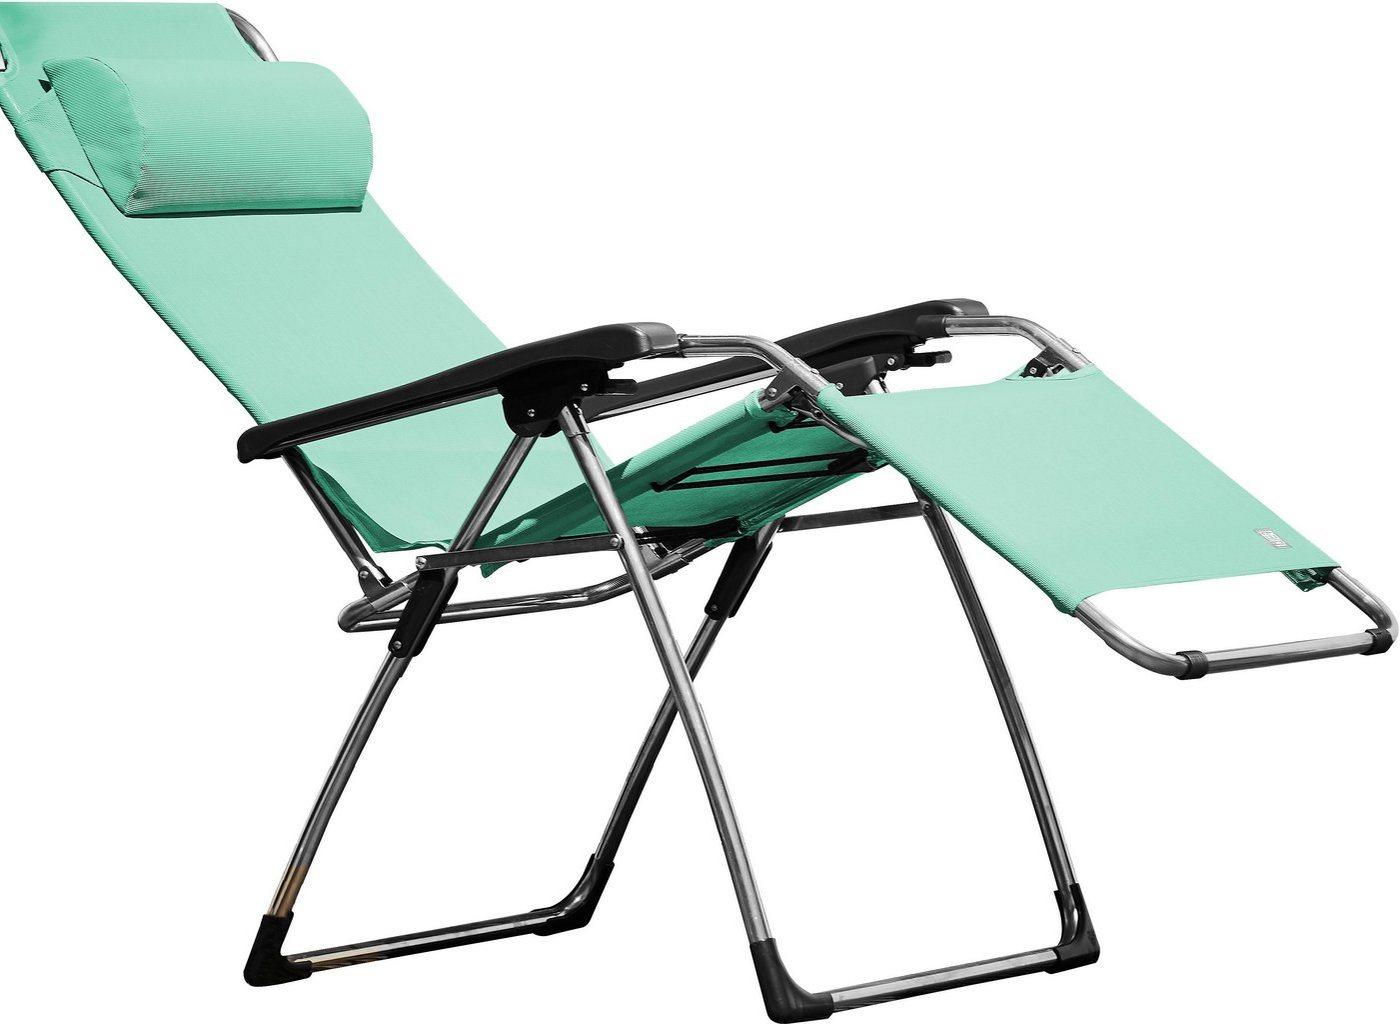 jankurtz outdoor stretcher amida